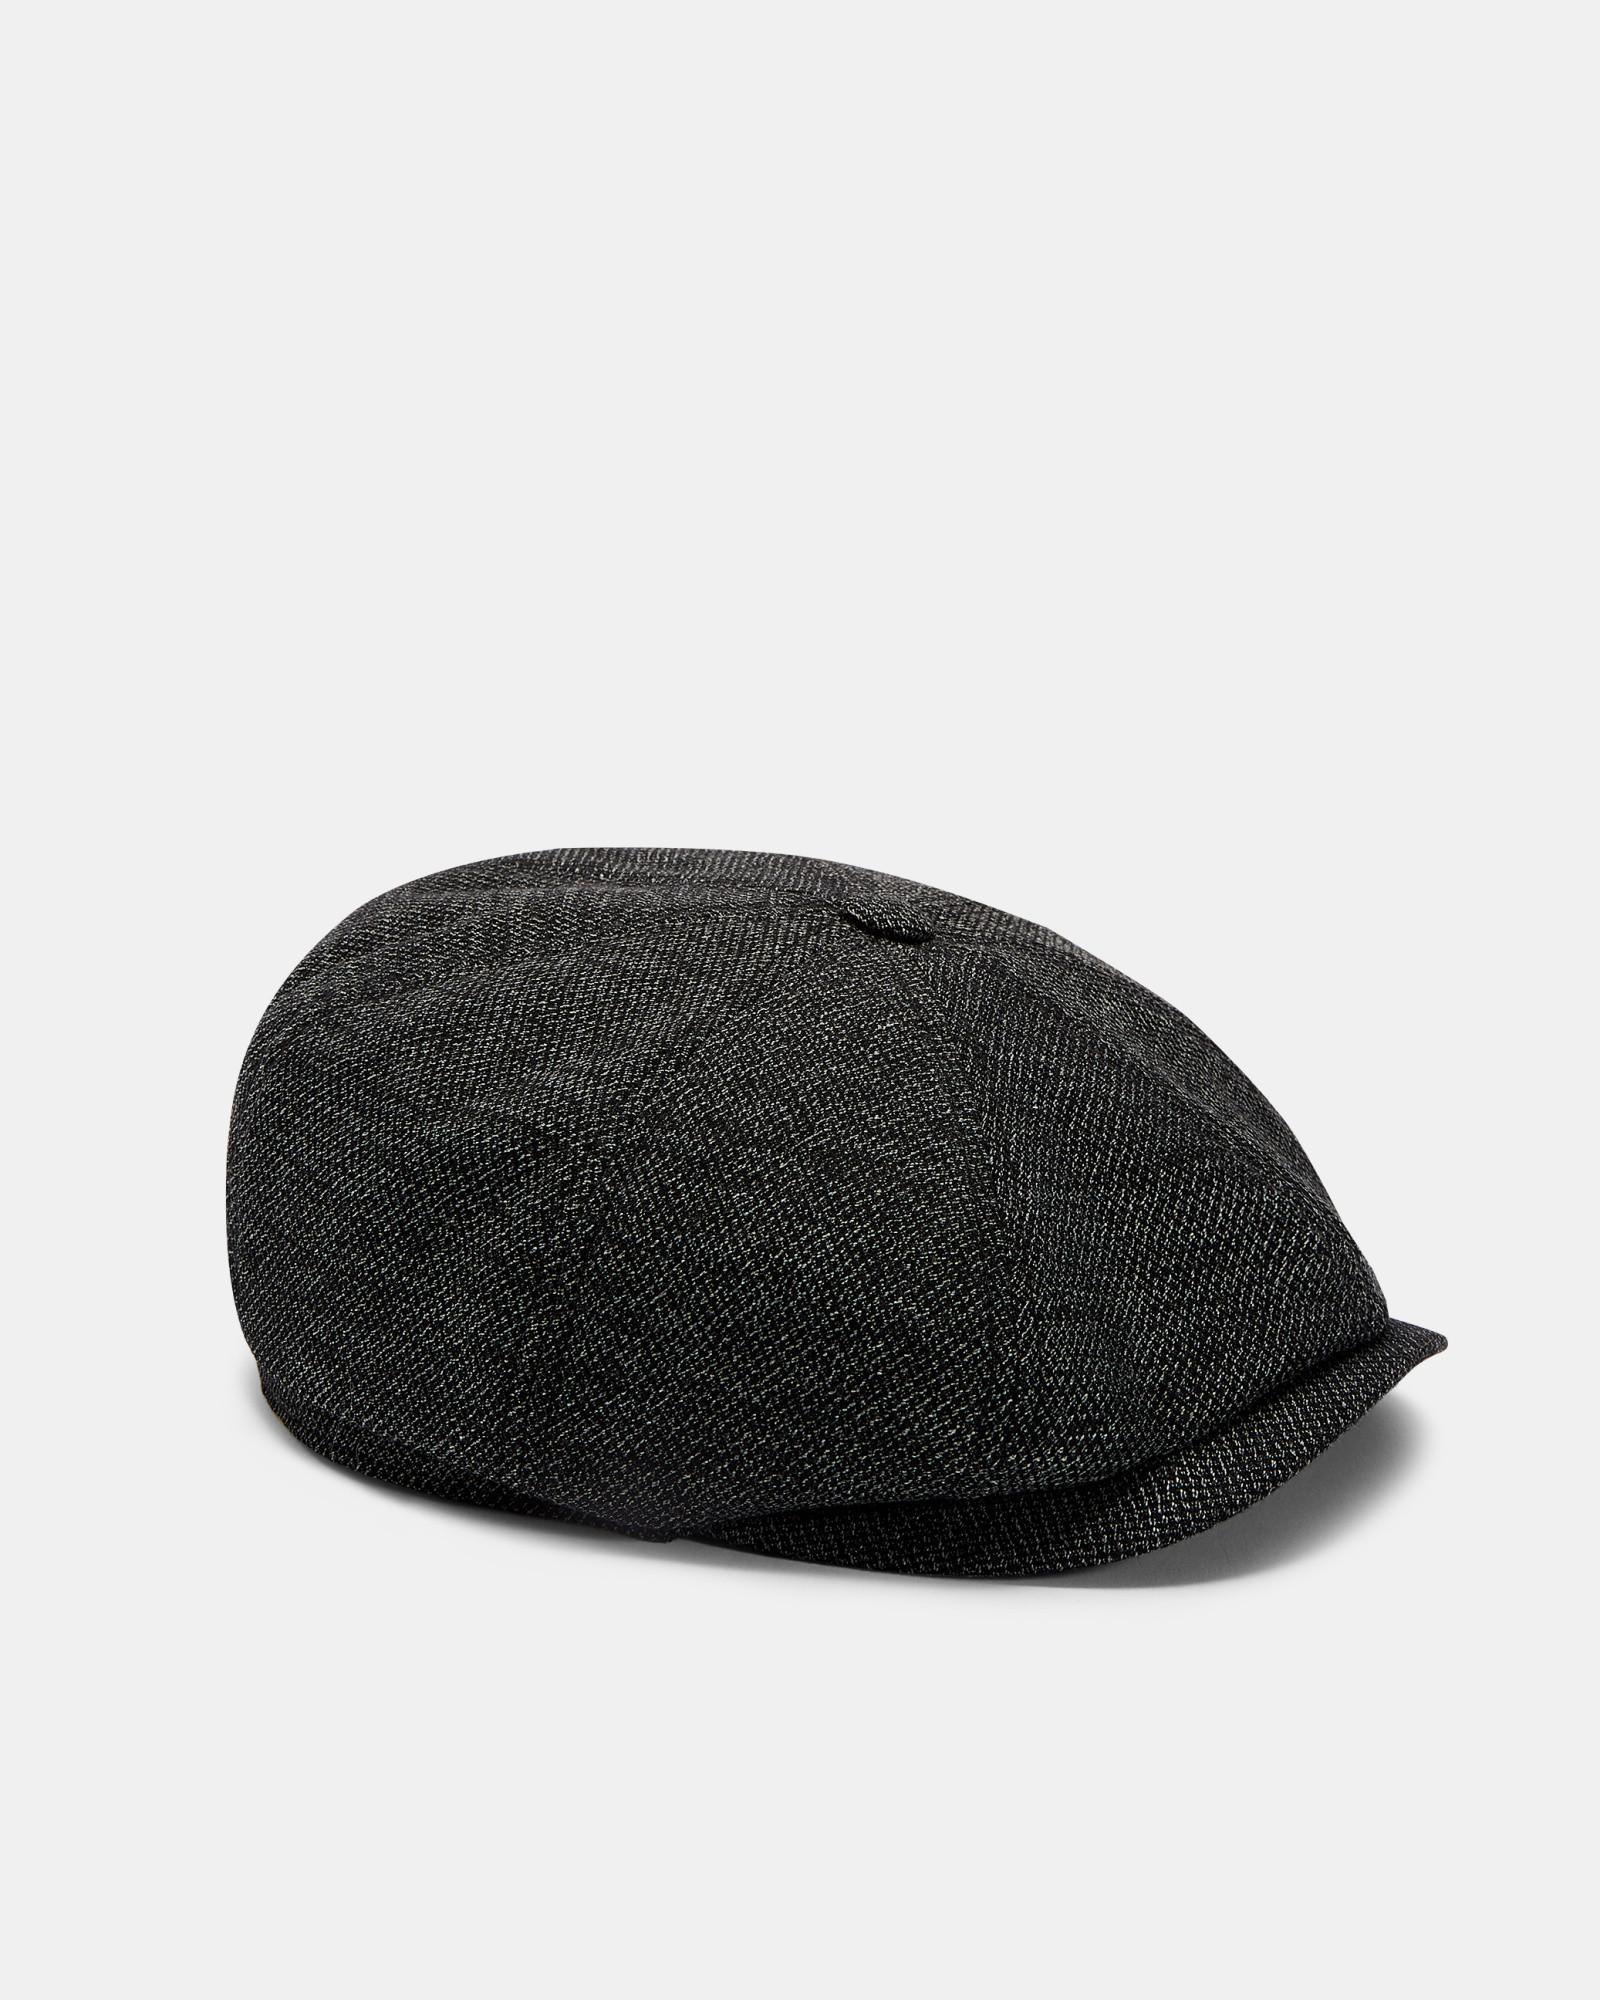 54bb82f477ebb4 Ted Baker Textured Baker Boy Hat in Gray for Men - Lyst